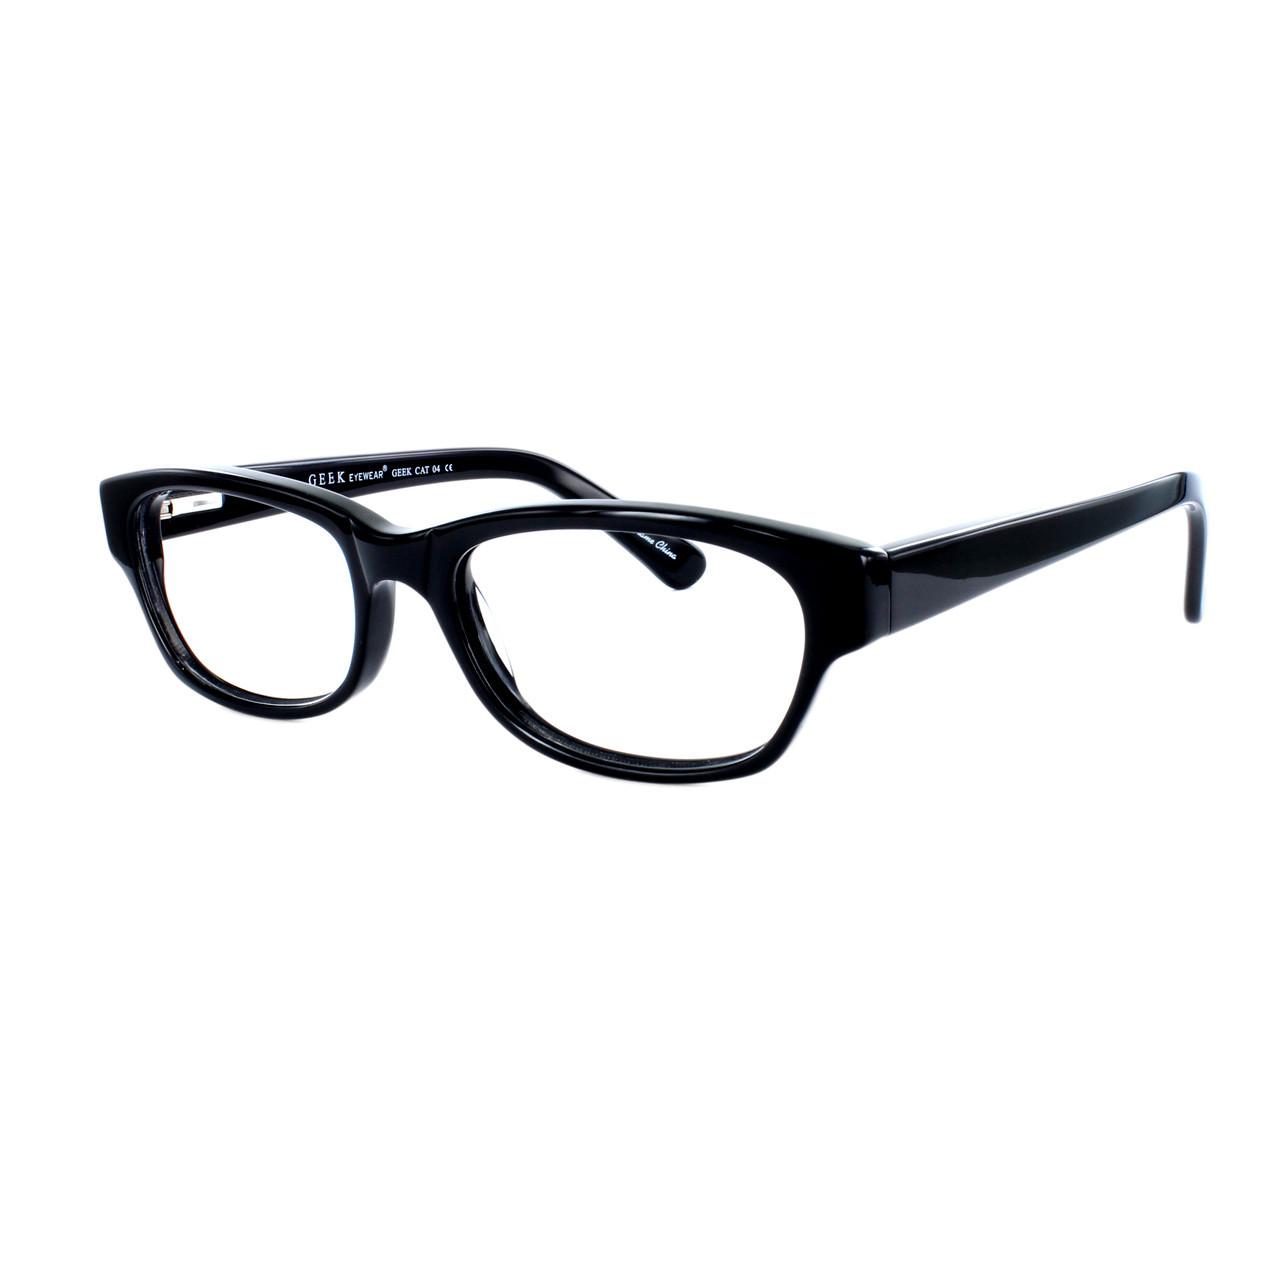 GEEK Eyewear GEEK CAT04